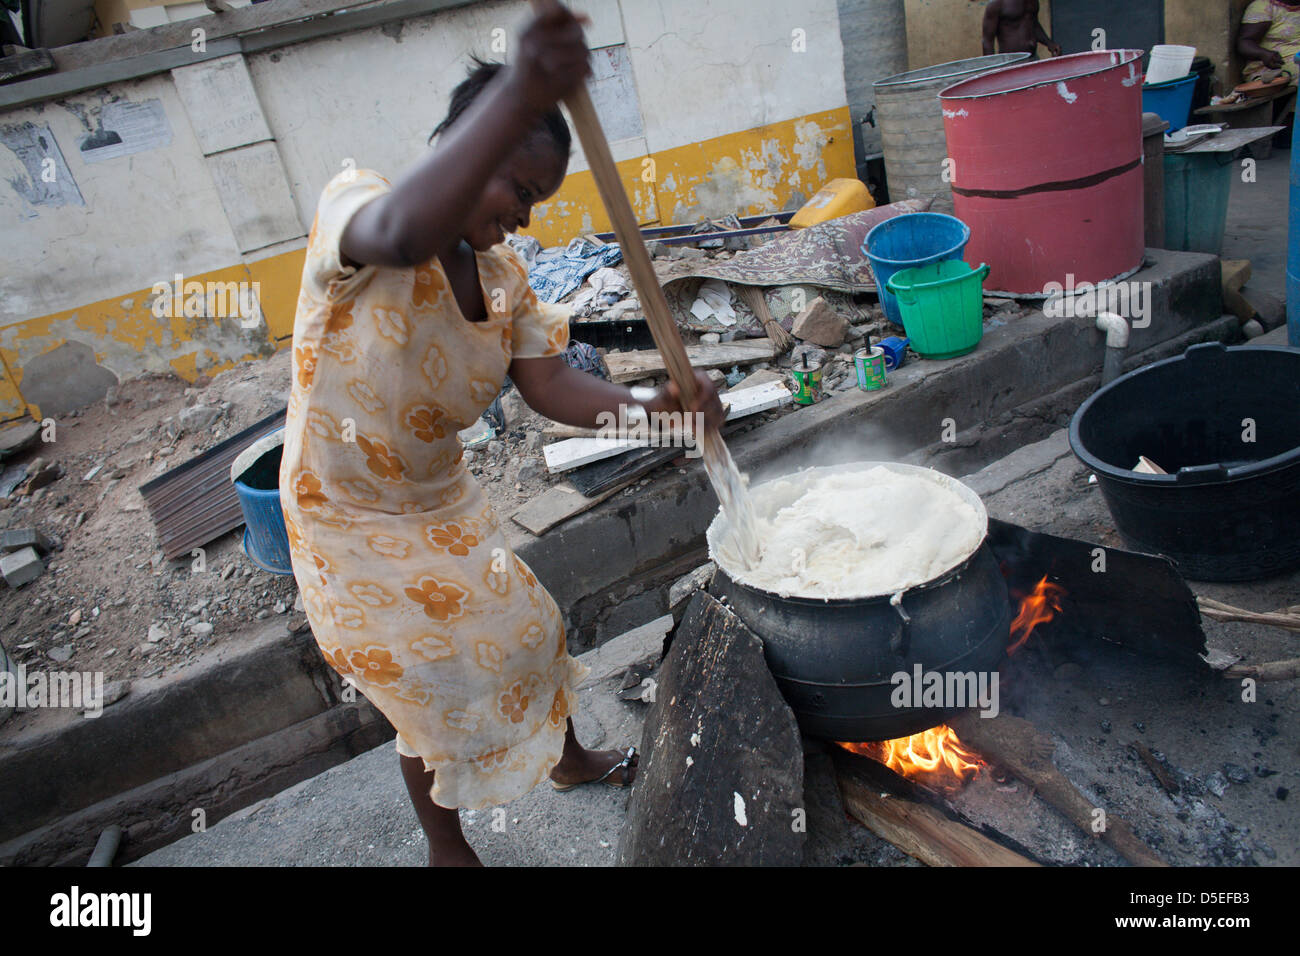 Banku is prepared in Accra, Ghana. - Stock Image